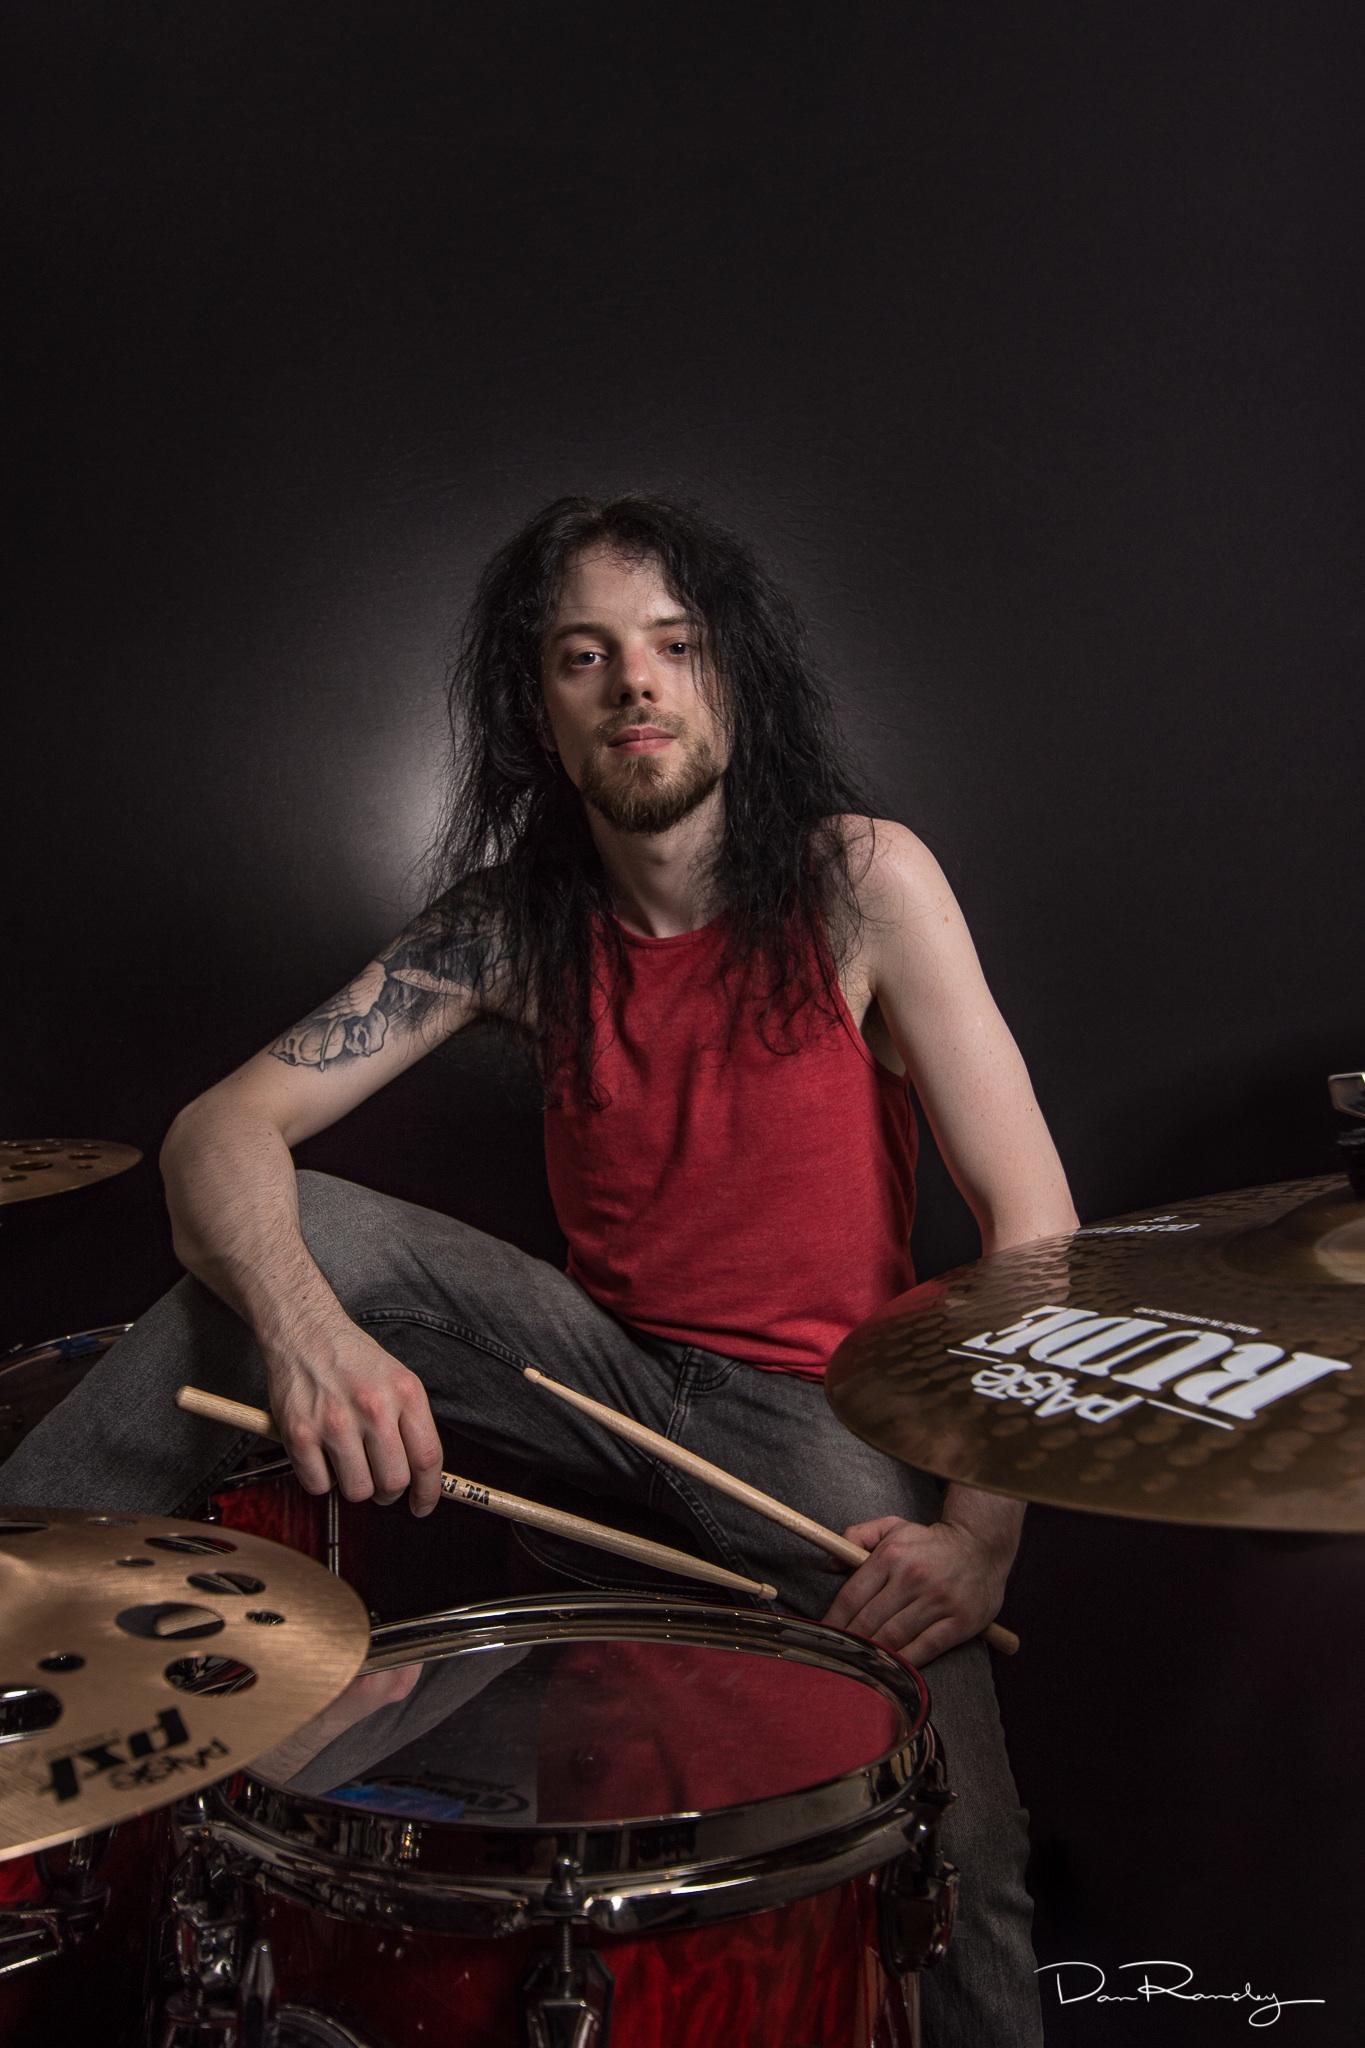 Greg Ison